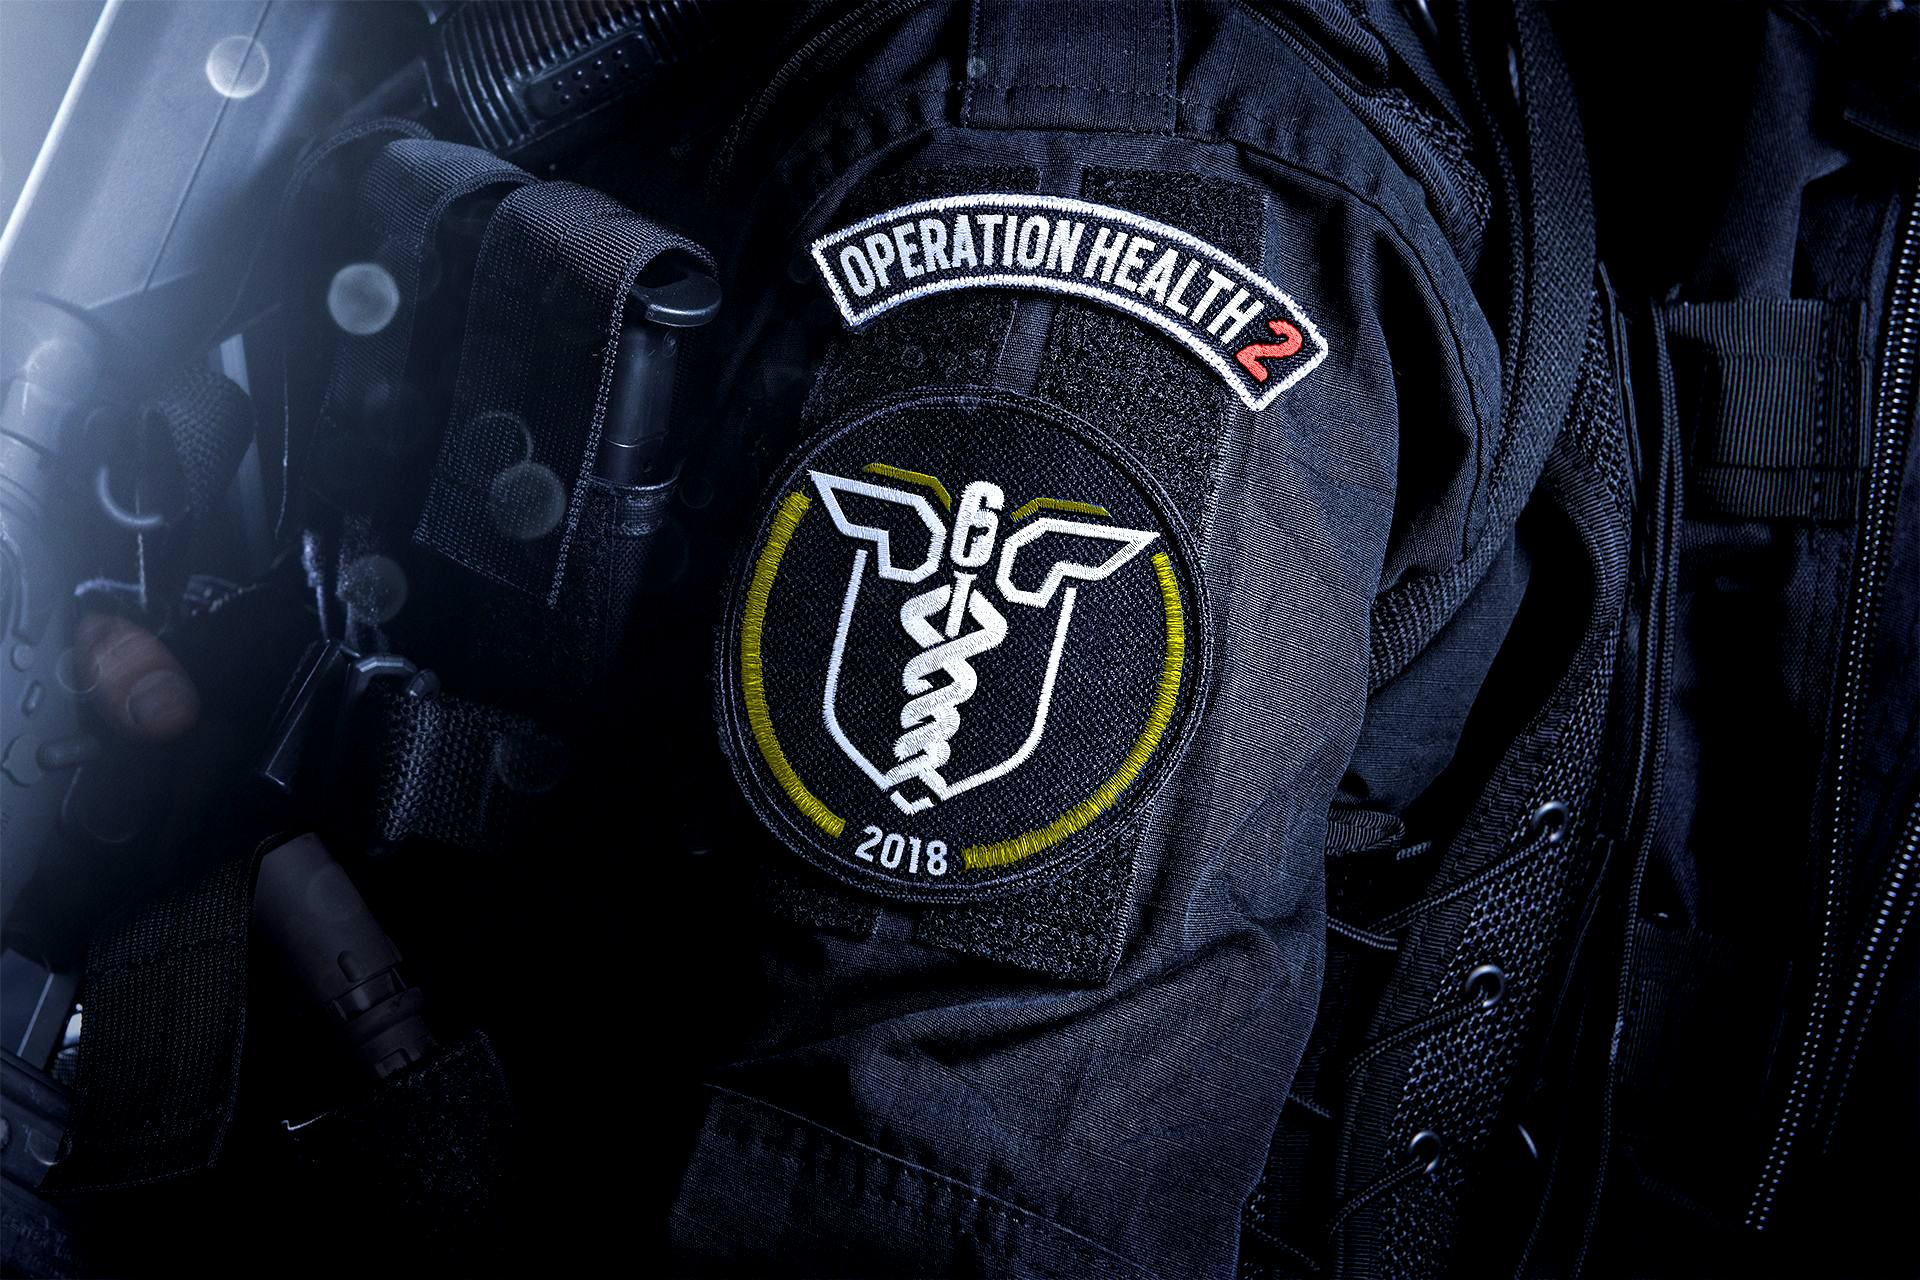 Rainbow Six Siege Operation Health 2